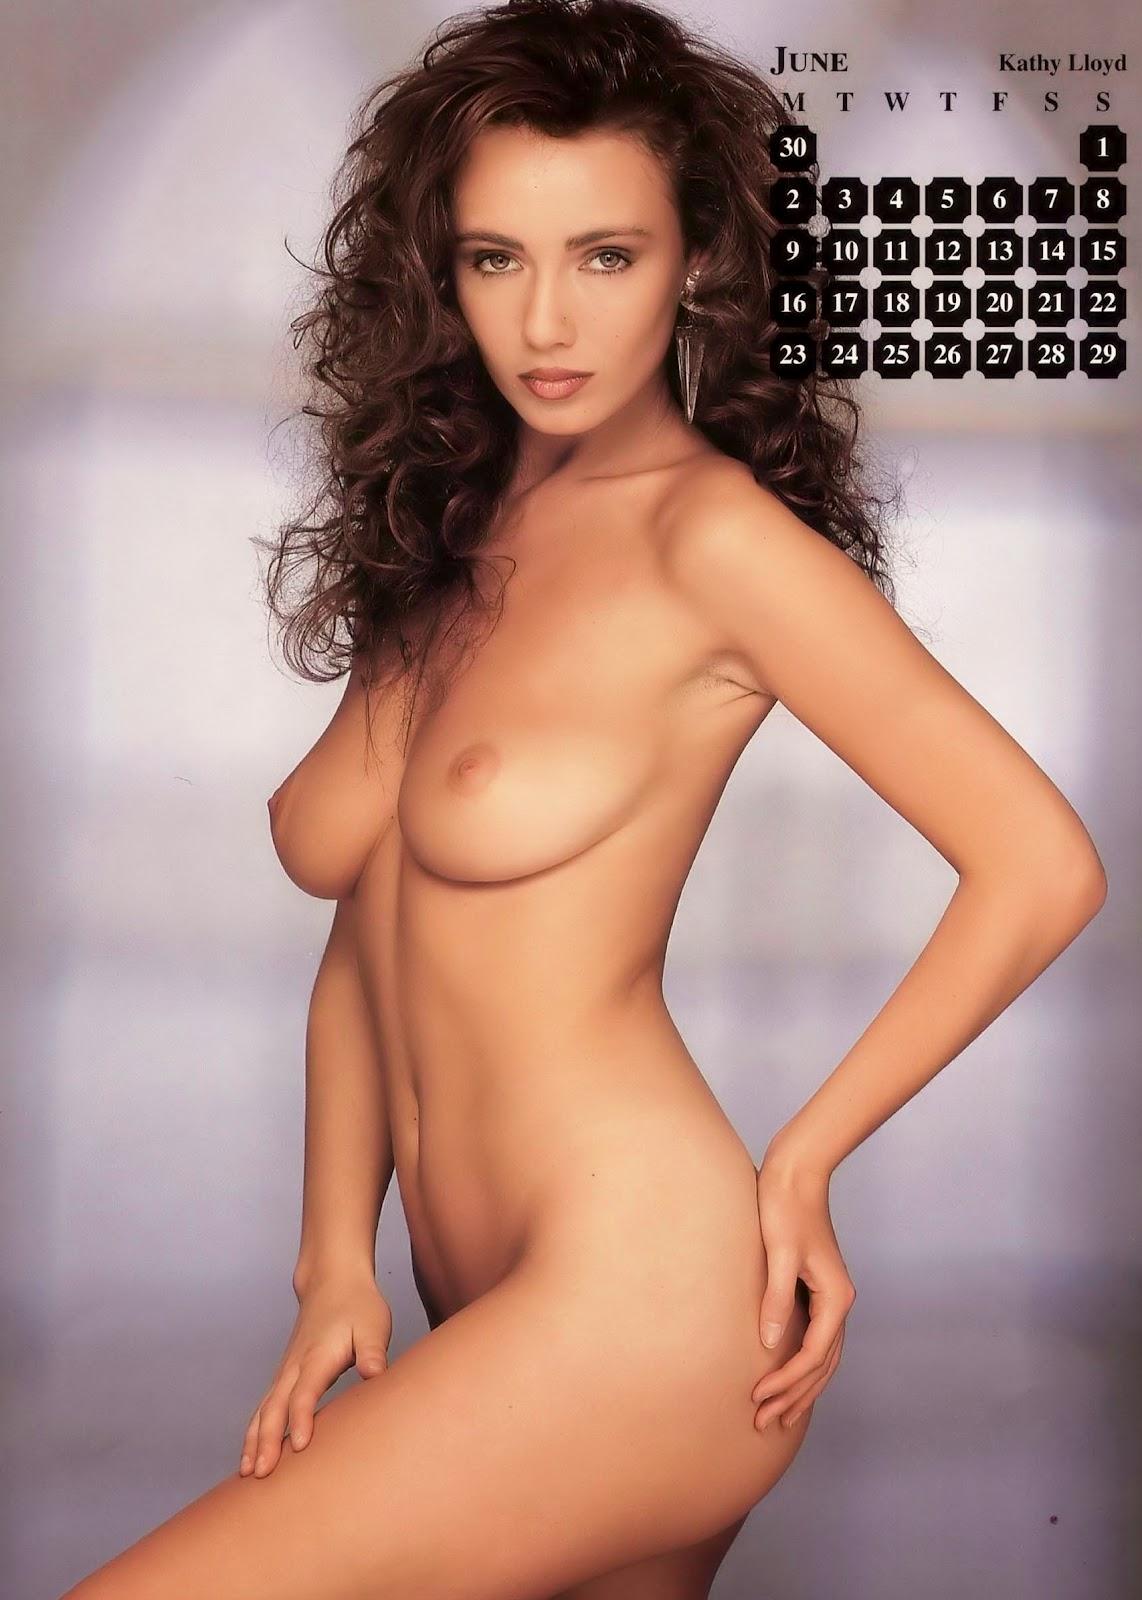 Congratulate, Kathy lloyd nude video